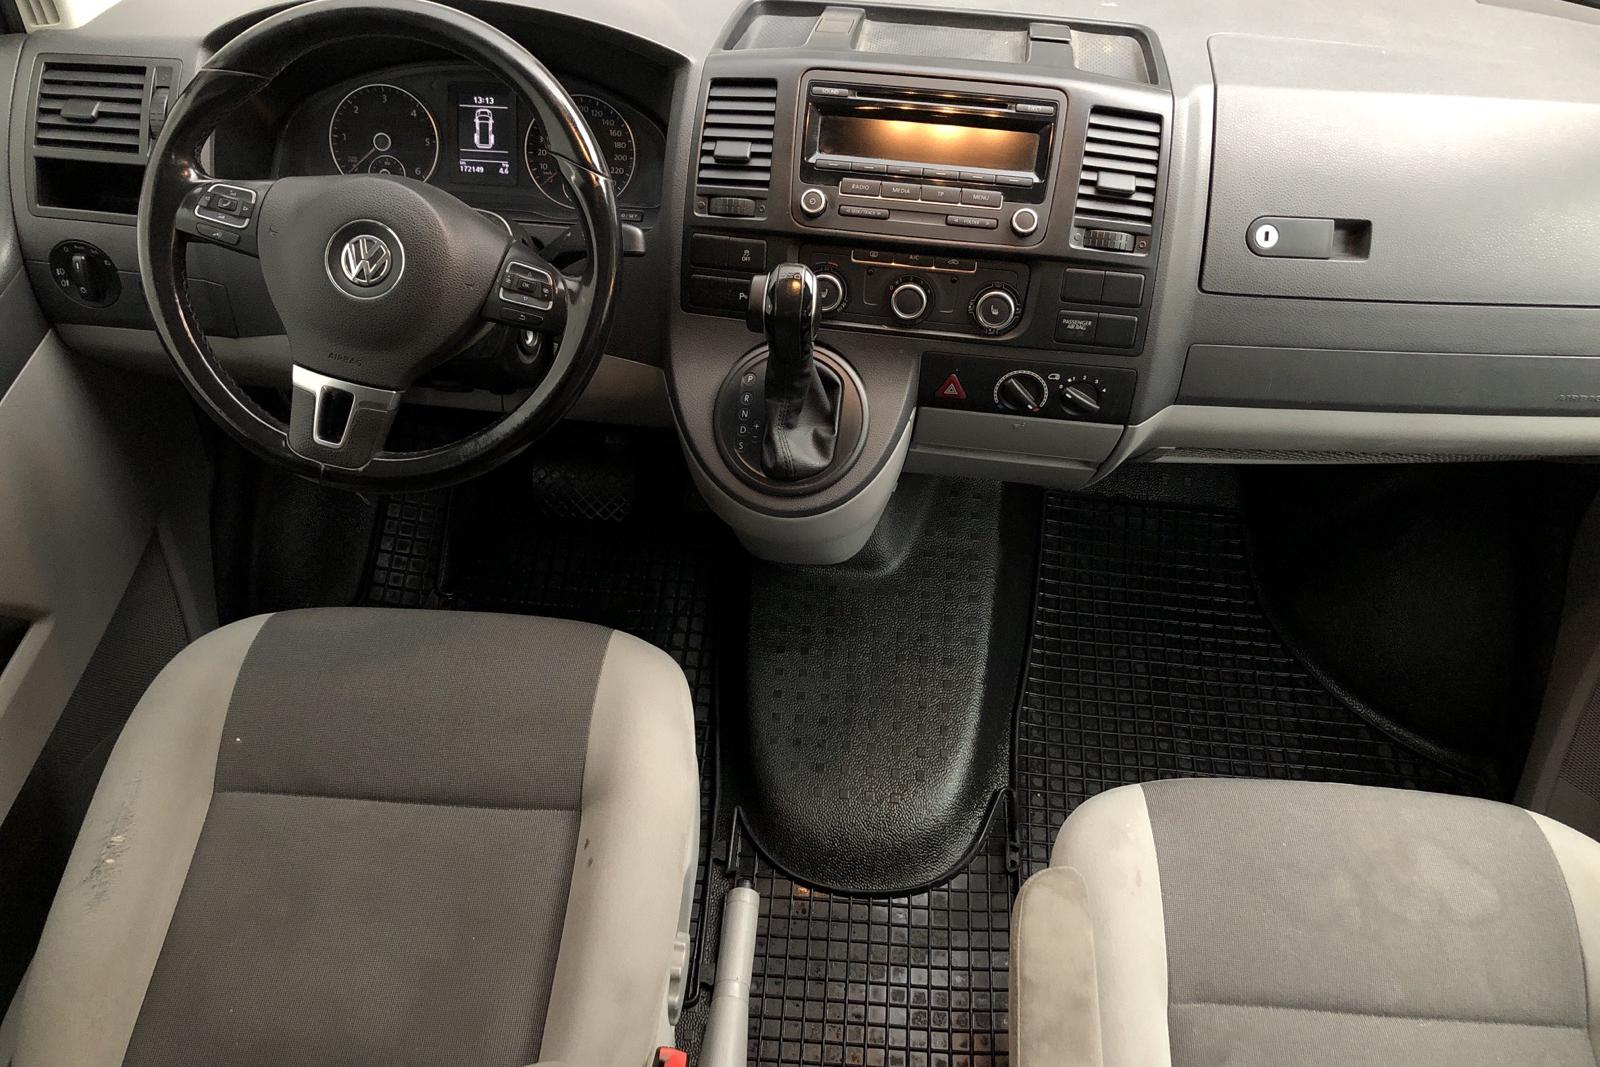 VW Transporter T5 2.0 TDI 4MOTION (180hk) - 18 800 mil - Automat - grå - 2014